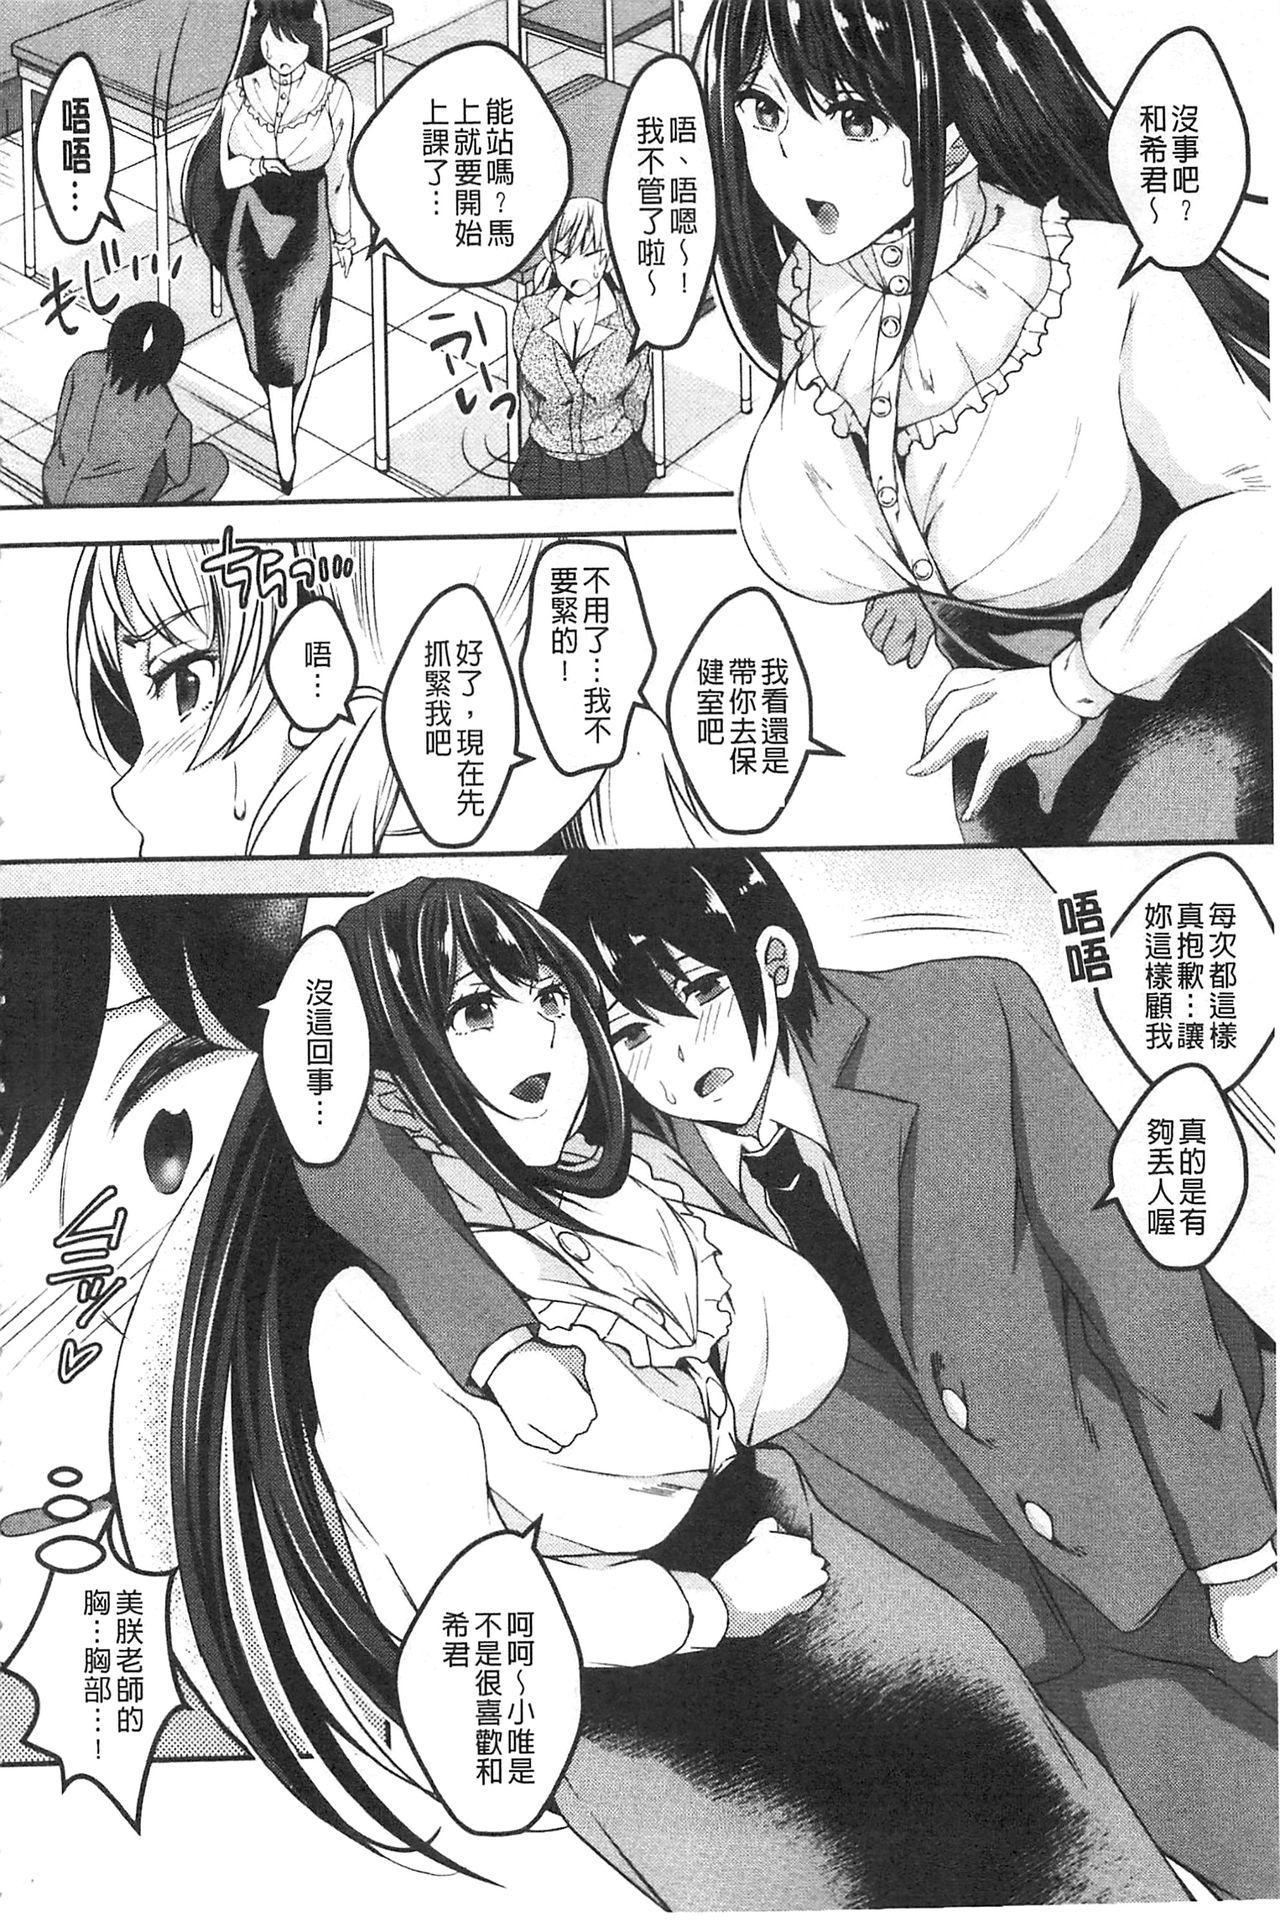 Kanjuku Otome no Odoshikata | 姦熟乙女的脅迫法 7